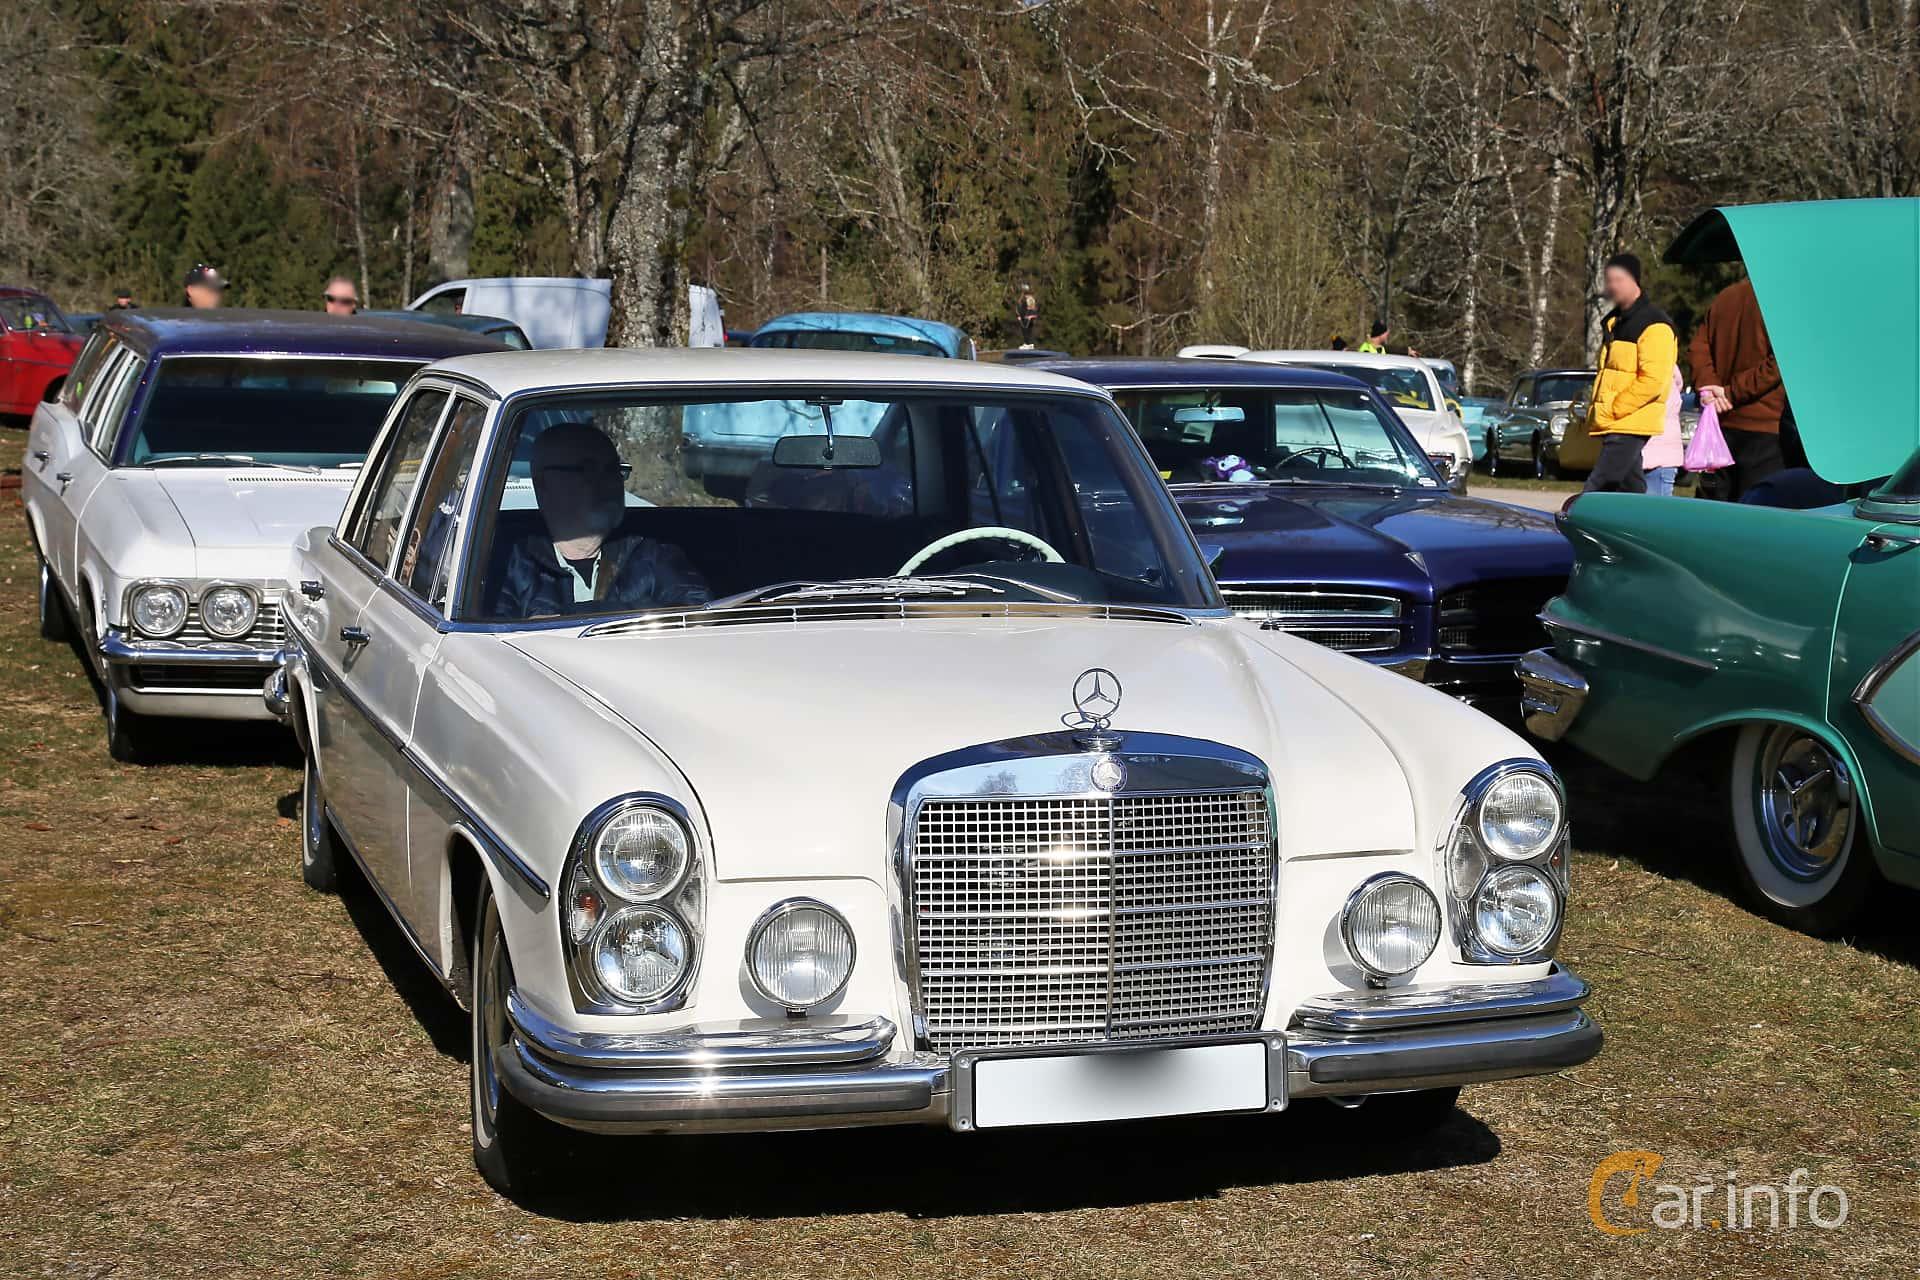 Mercedes-Benz 280 S  Manual, 140hp, 1968 at Uddevalla Veteranbilsmarknad Backamo, Ljungsk 2019